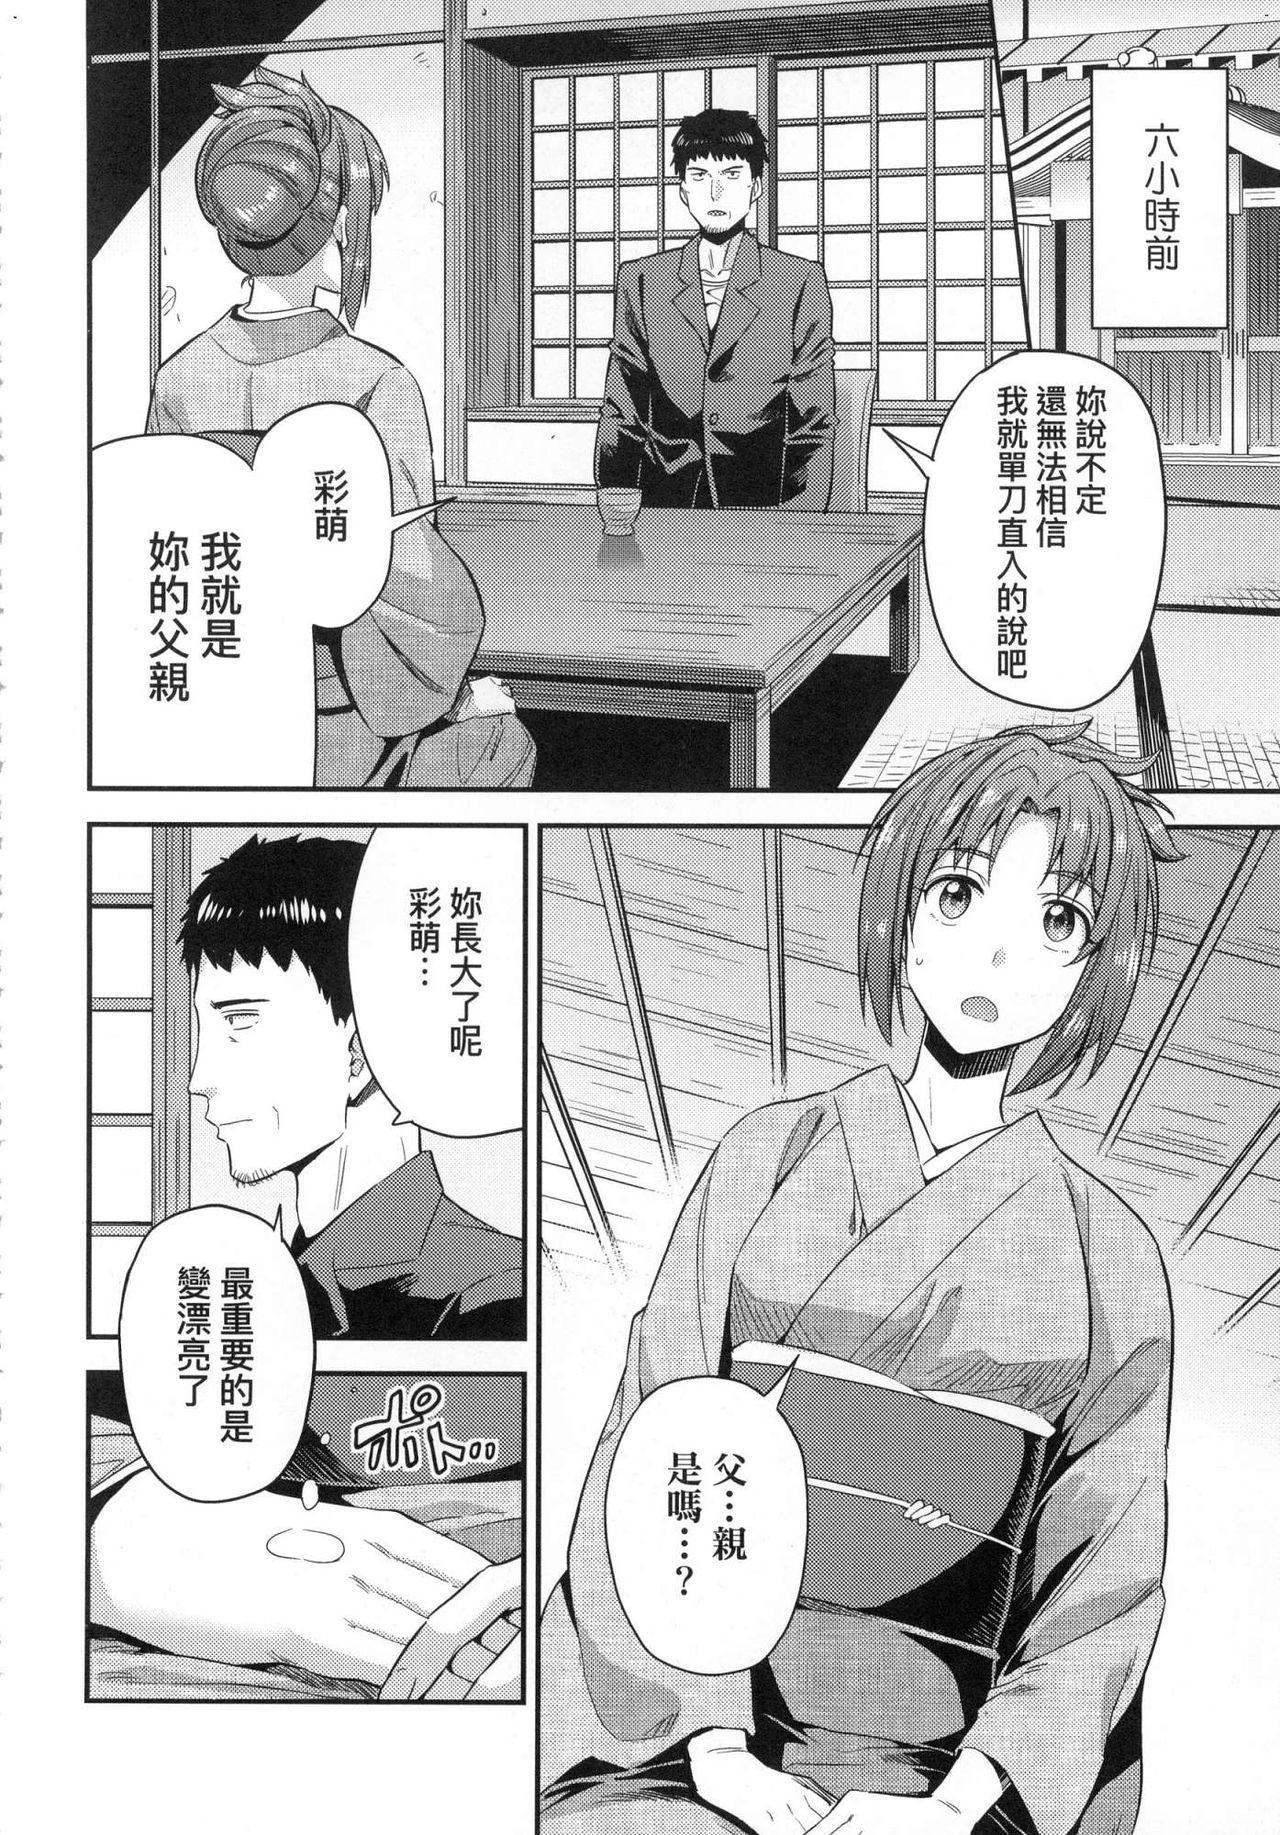 Kyousei Tanetsuke Express - Forced Seeding Express 195